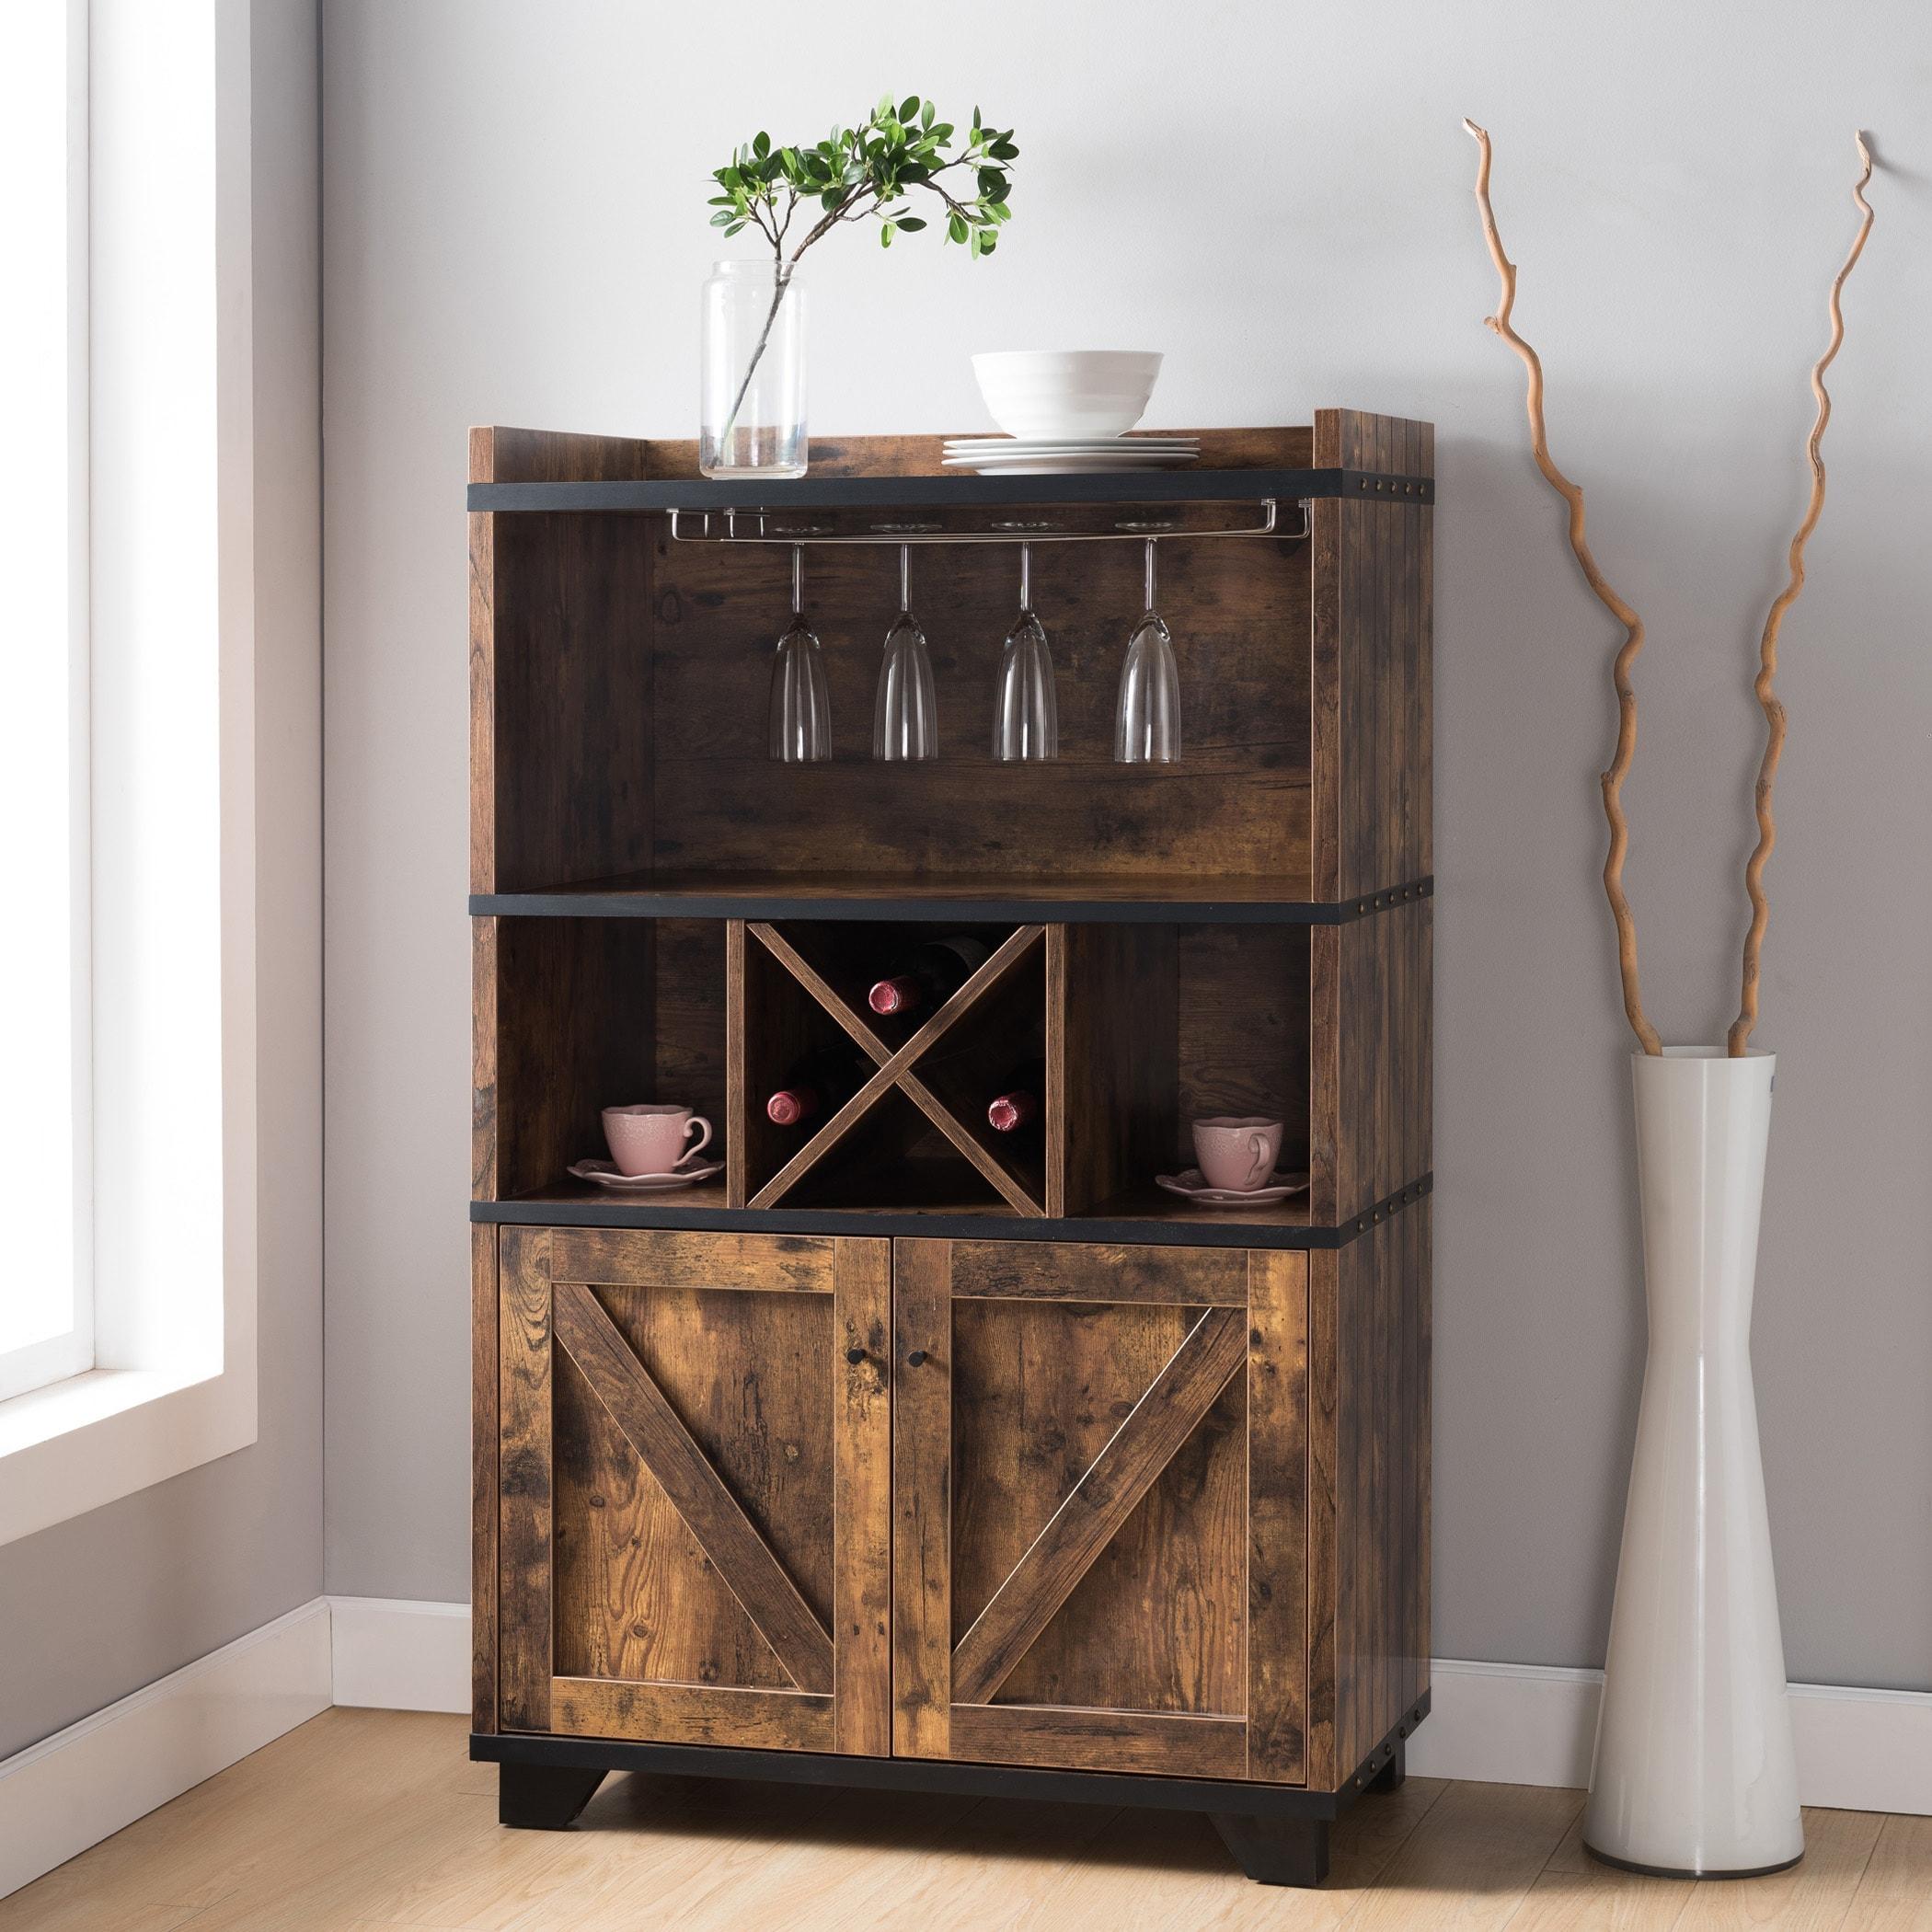 itm wesleyan buffet america distressed wine farmhouse cabinet of furniture rustic